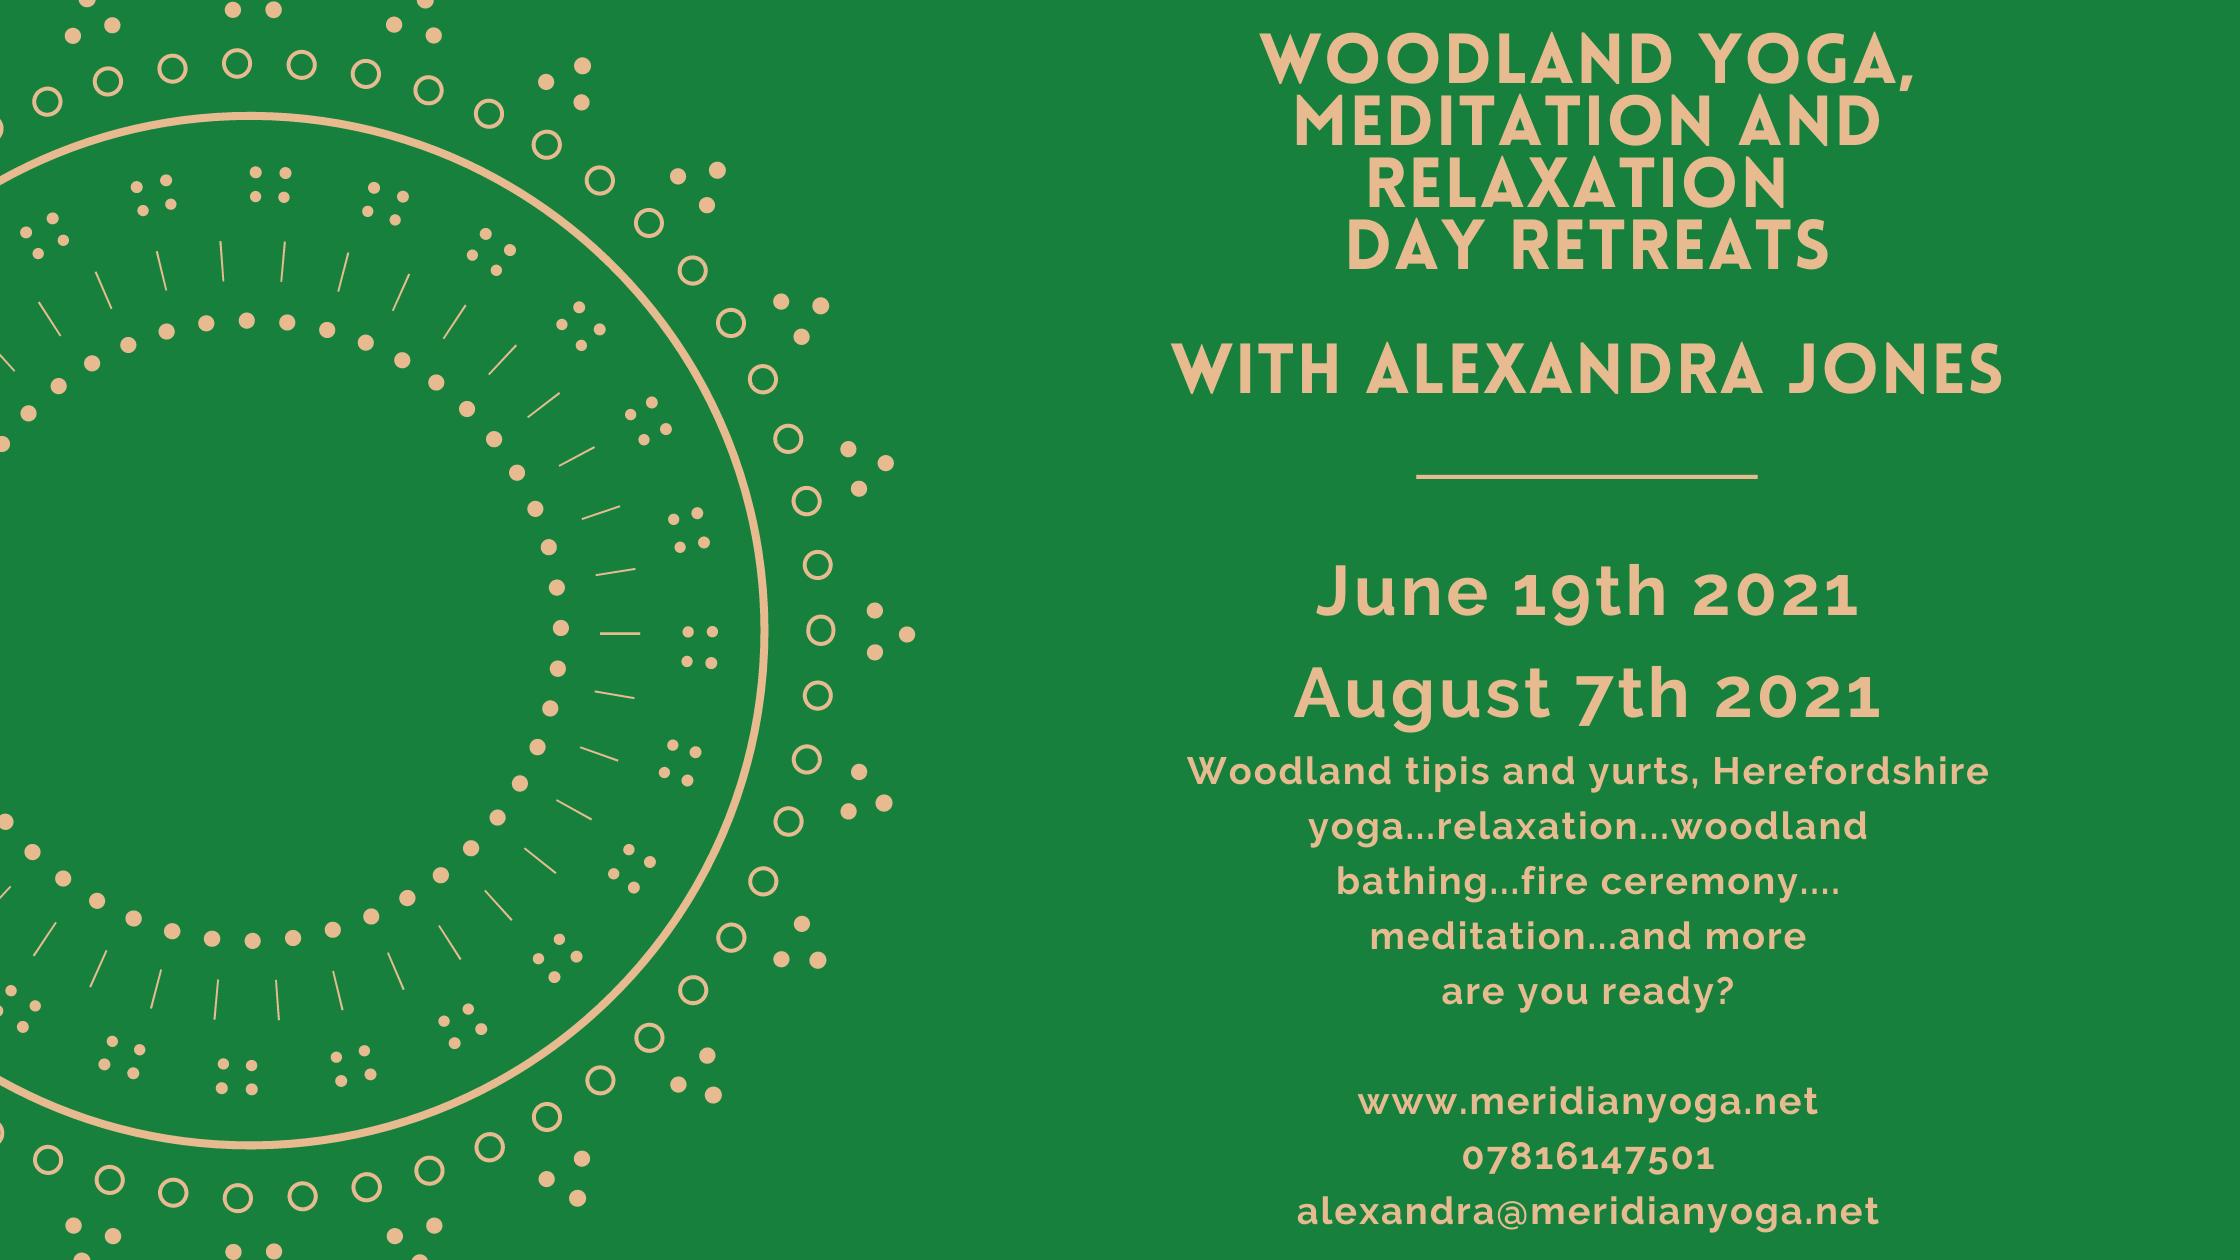 Woodland Yoga Retreat